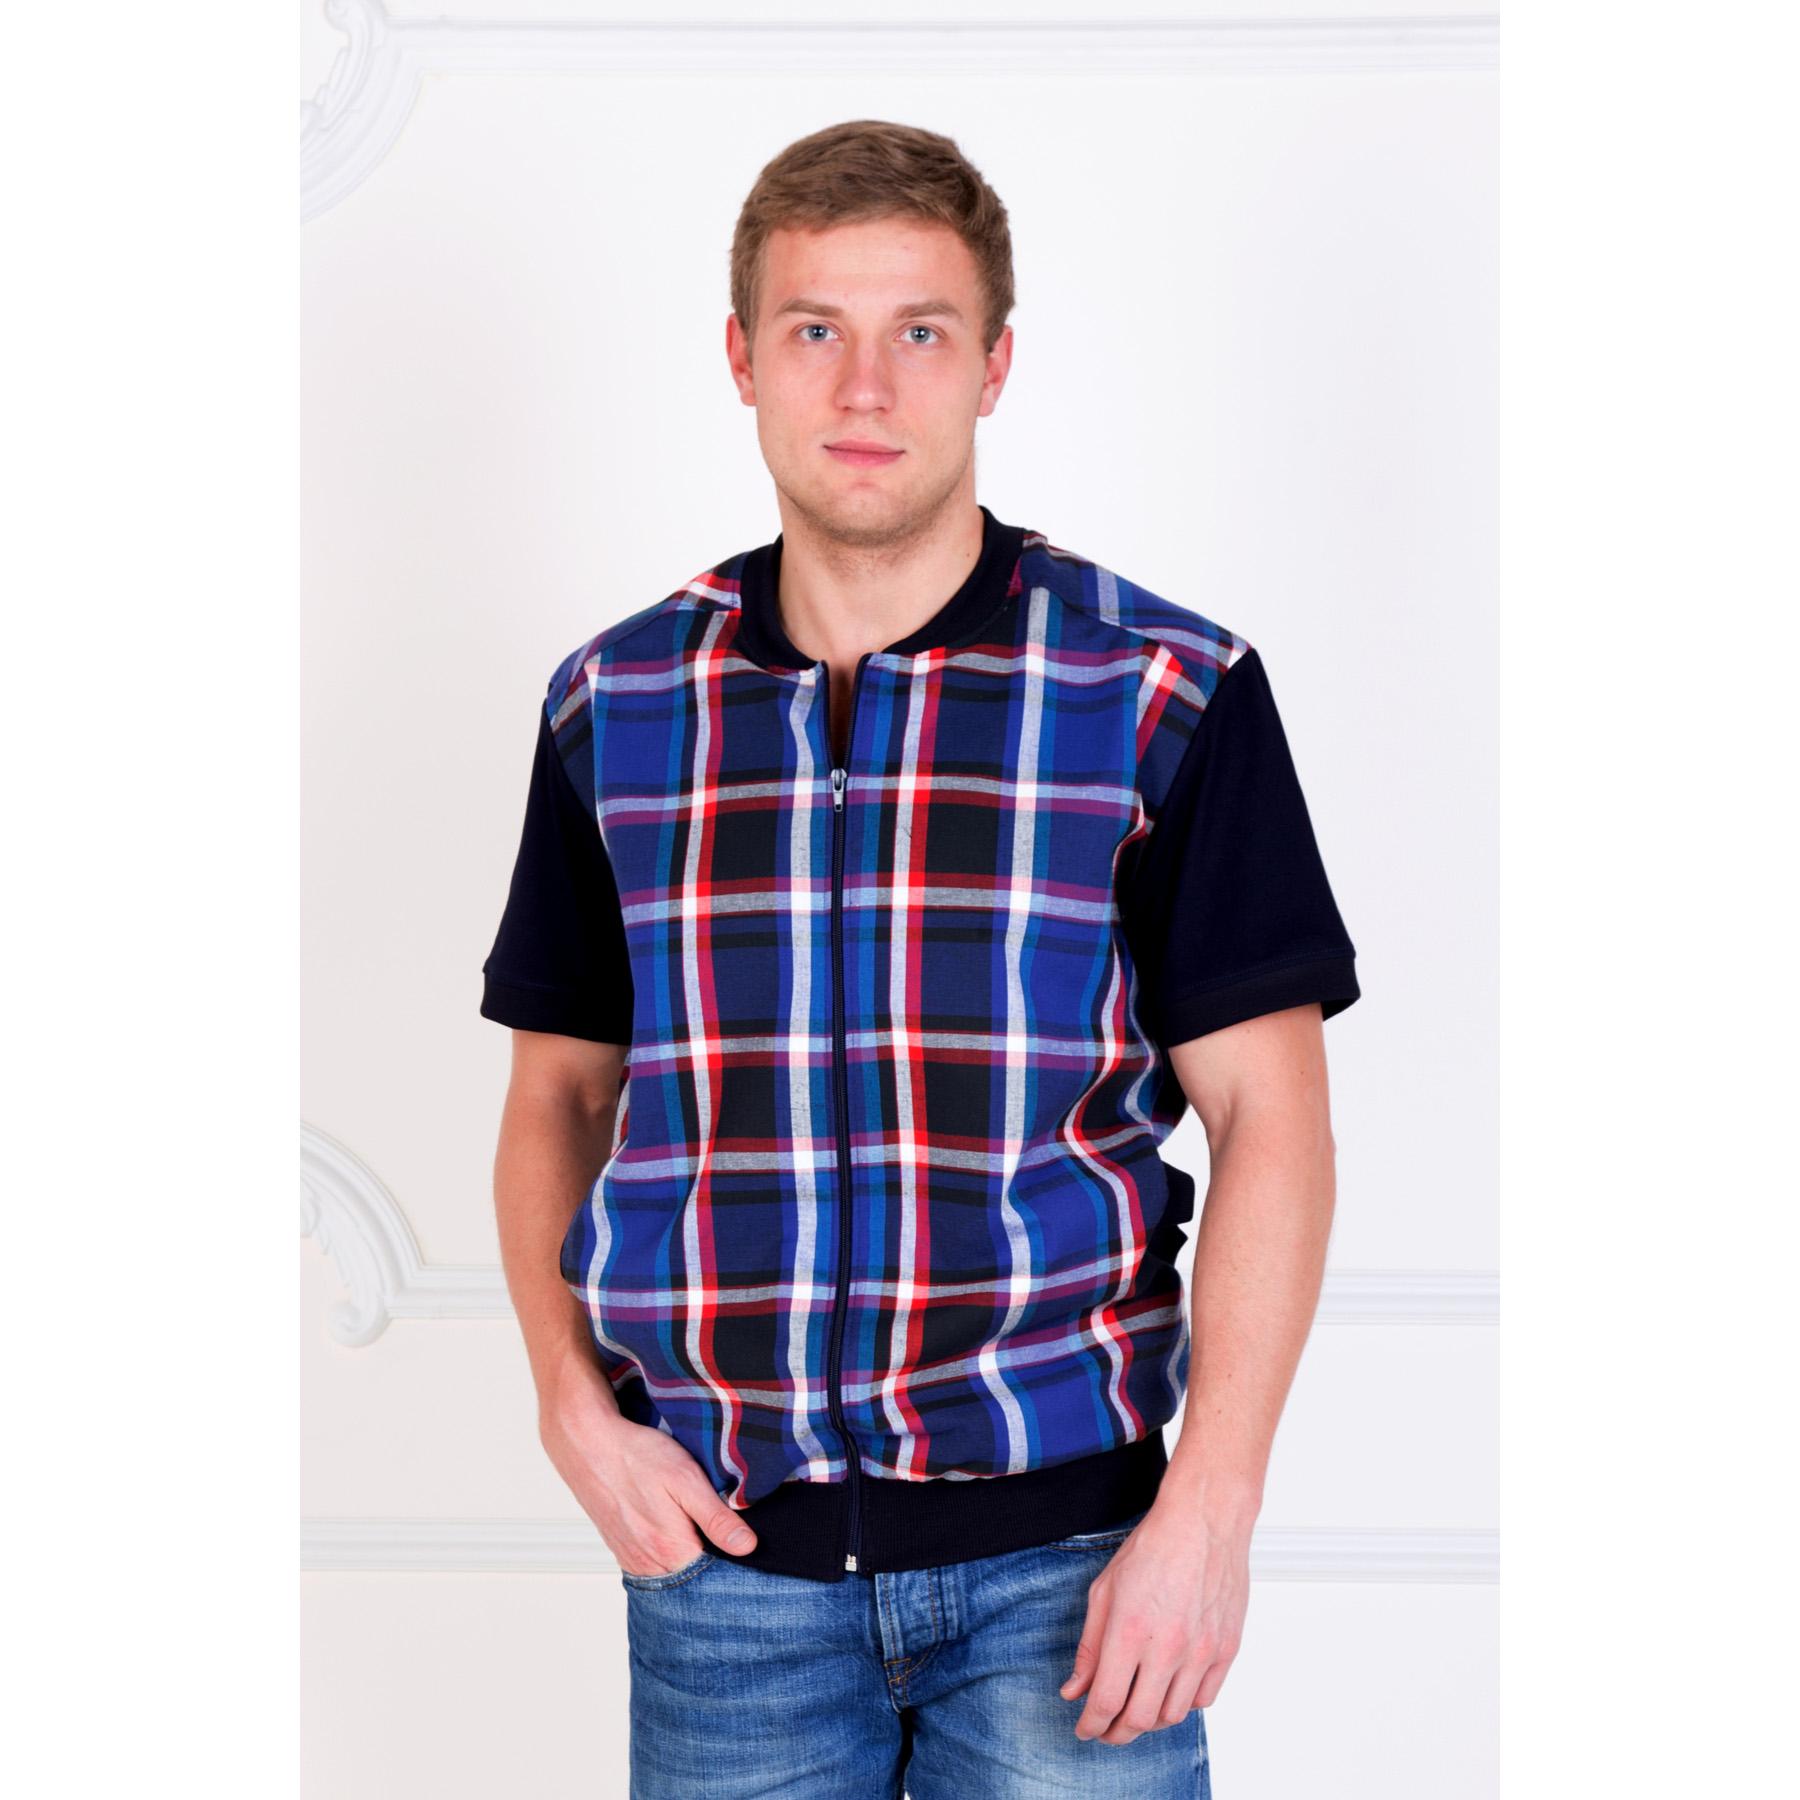 Мужская рубашка «Аполлон» , размер 44Толстовки, джемпера и рубашки<br>Обхват груди:88 см<br>Обхват талии:78 см<br>Обхват бедер:94 см<br>Рост:170-176 см<br><br>Тип: Муж. рубашка<br>Размер: 44<br>Материал: Шотландка